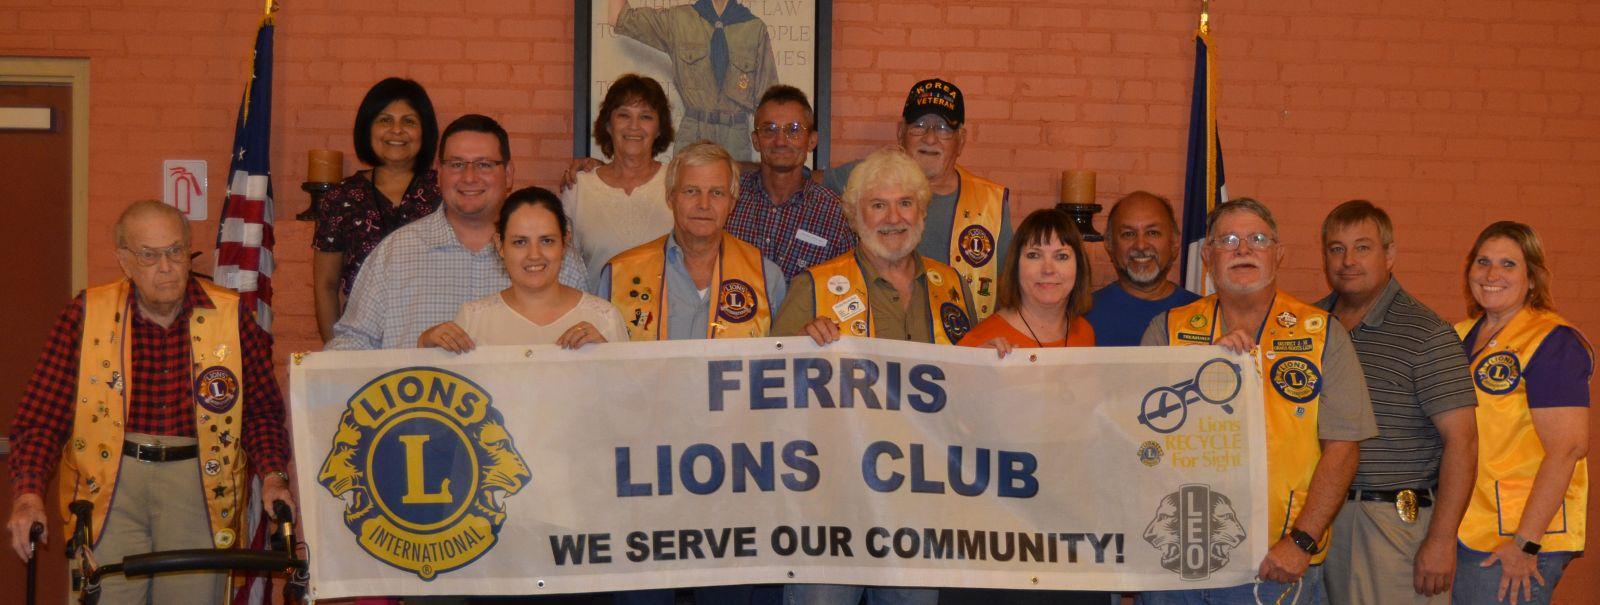 Ferris Lions Club 2017